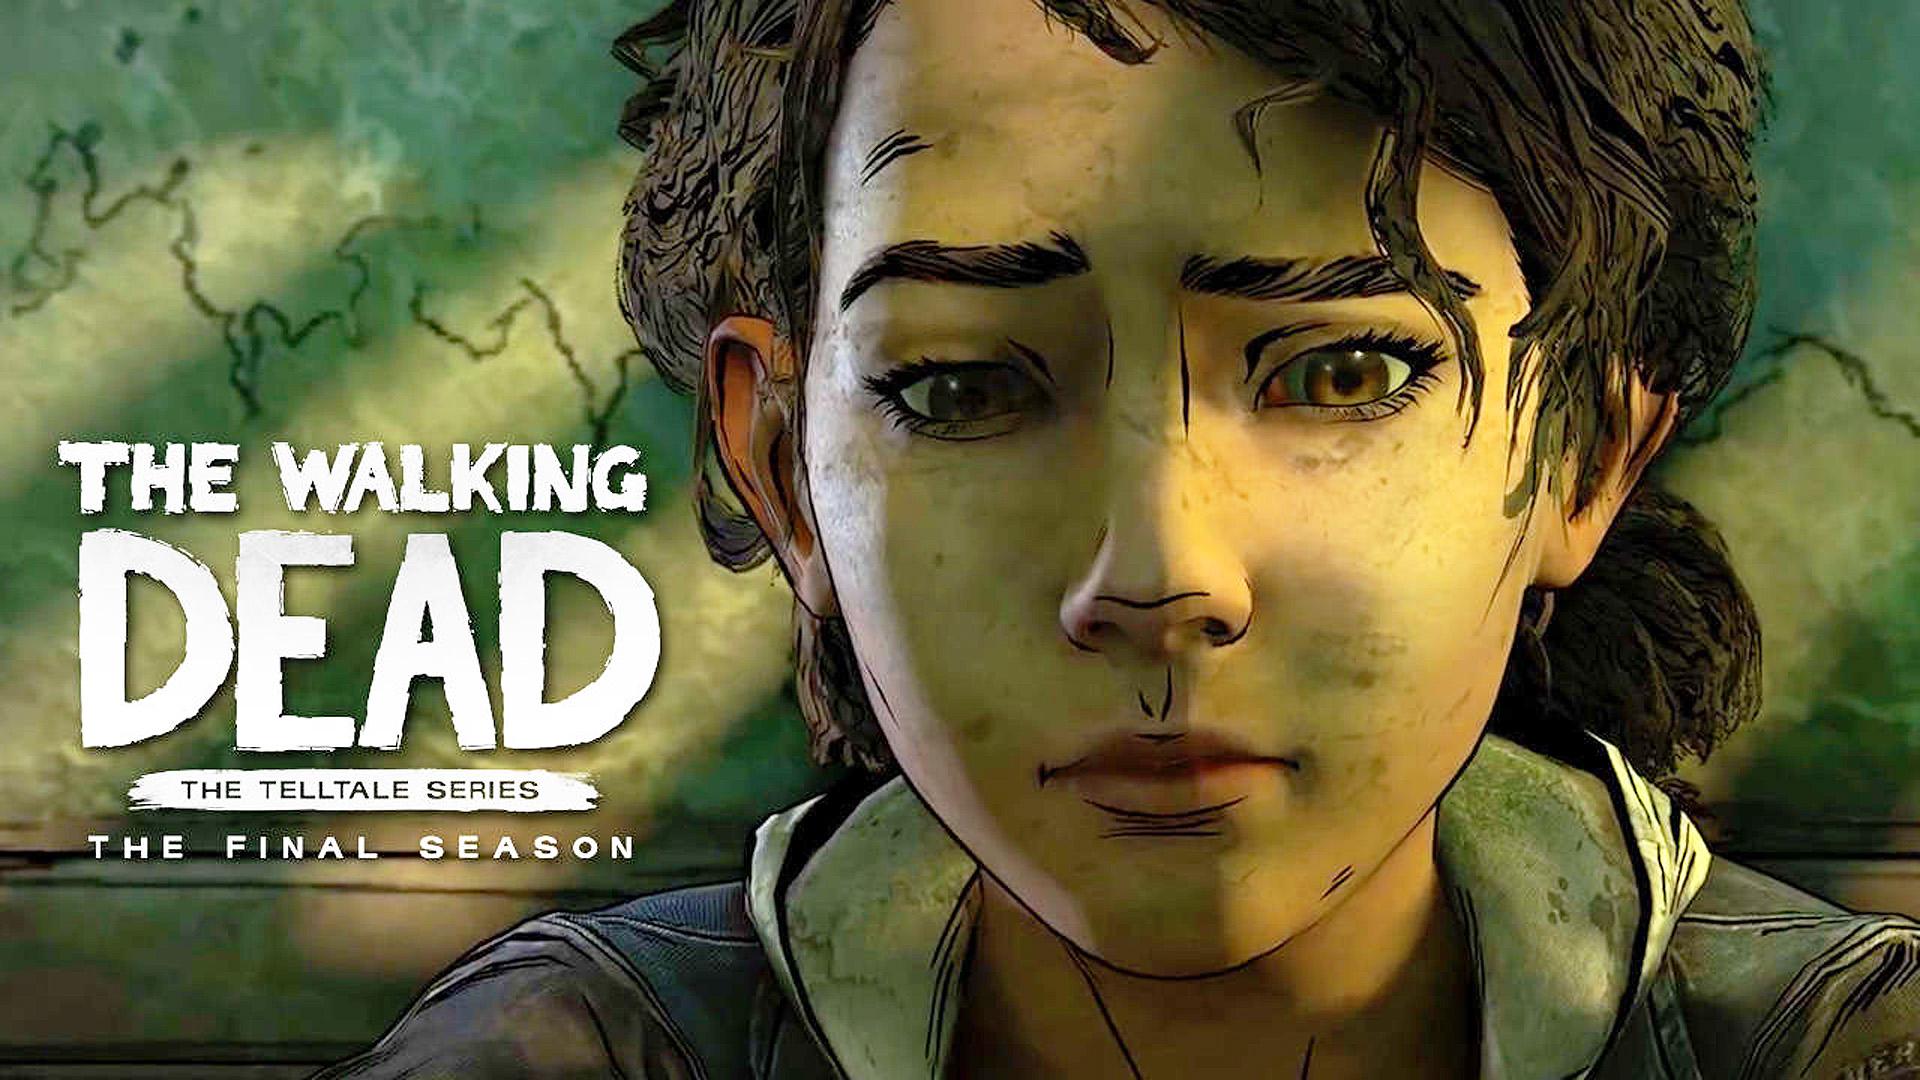 The Walking Dead The Final Season Episode 3 Review A